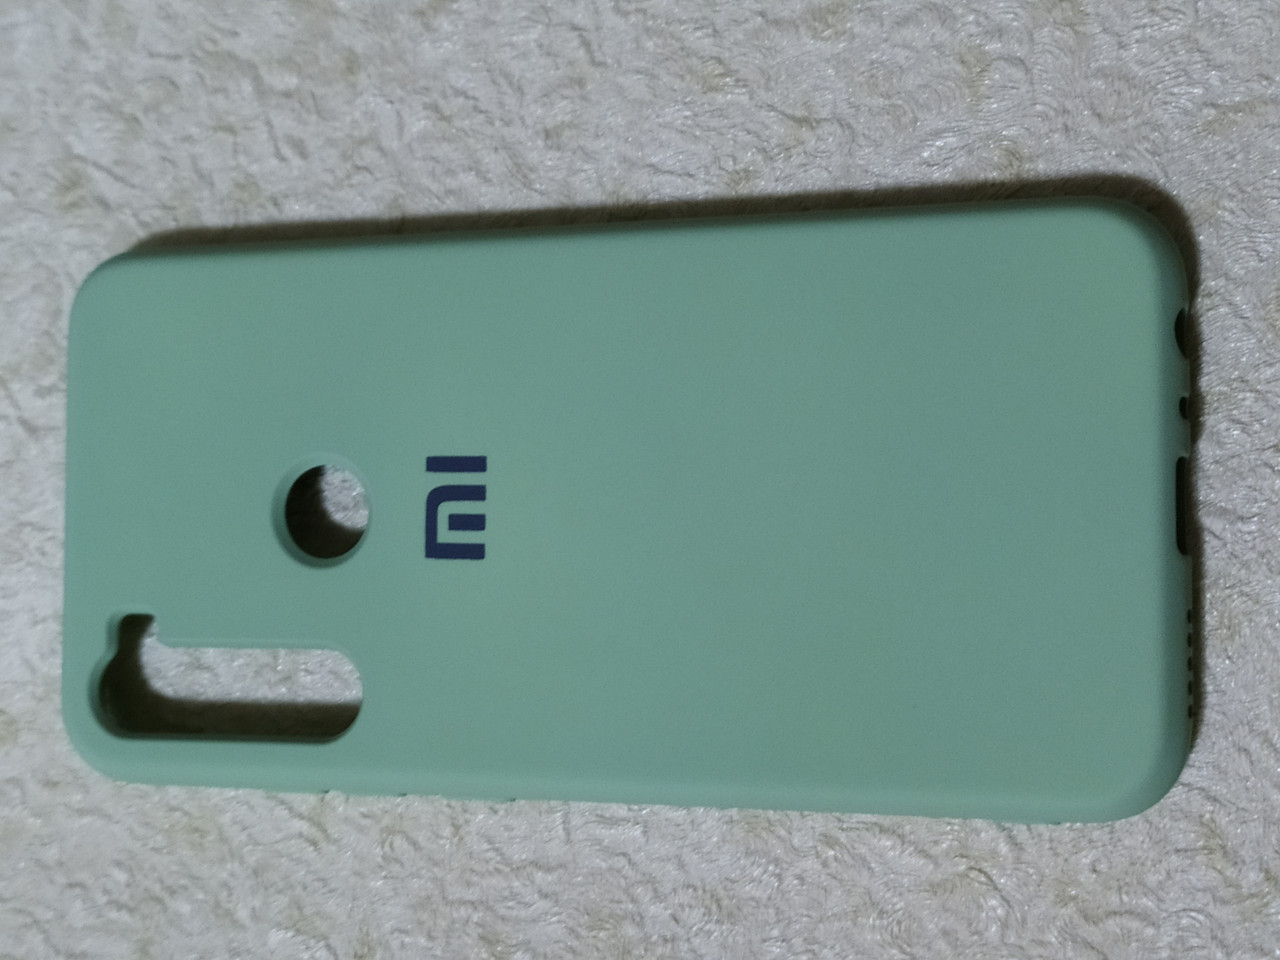 Накладка   Silicon Cover full   для  Xiaomi Redmi  Note 8  (мятный)